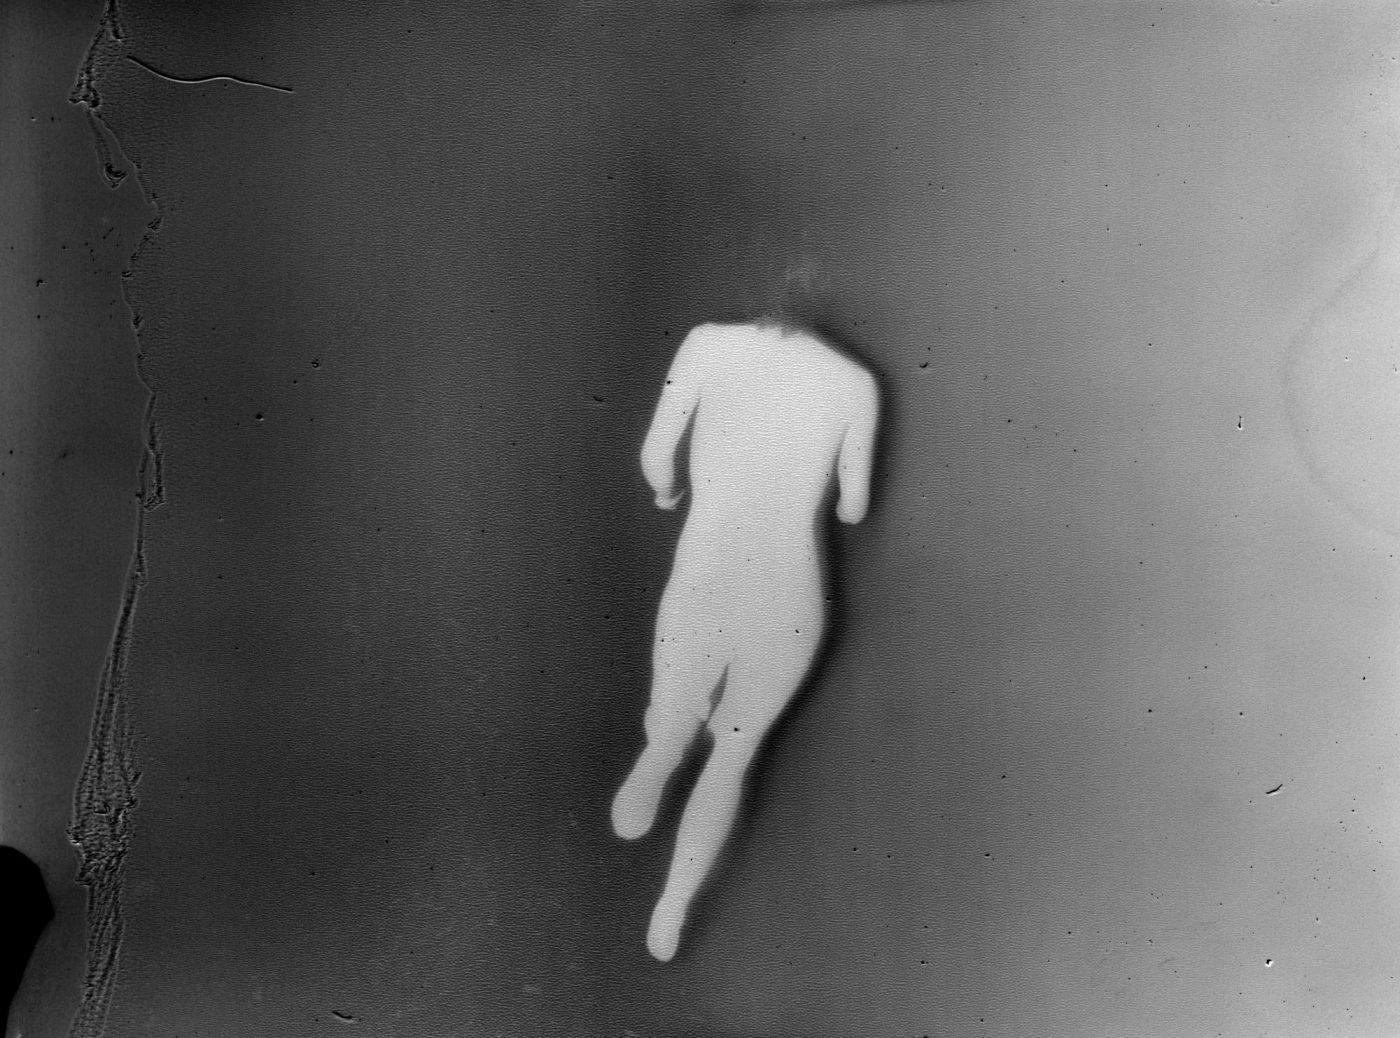 UNTITLED #3, 2012, by DAISUKE YOKOTA, offered by Christophe Guye Galerie